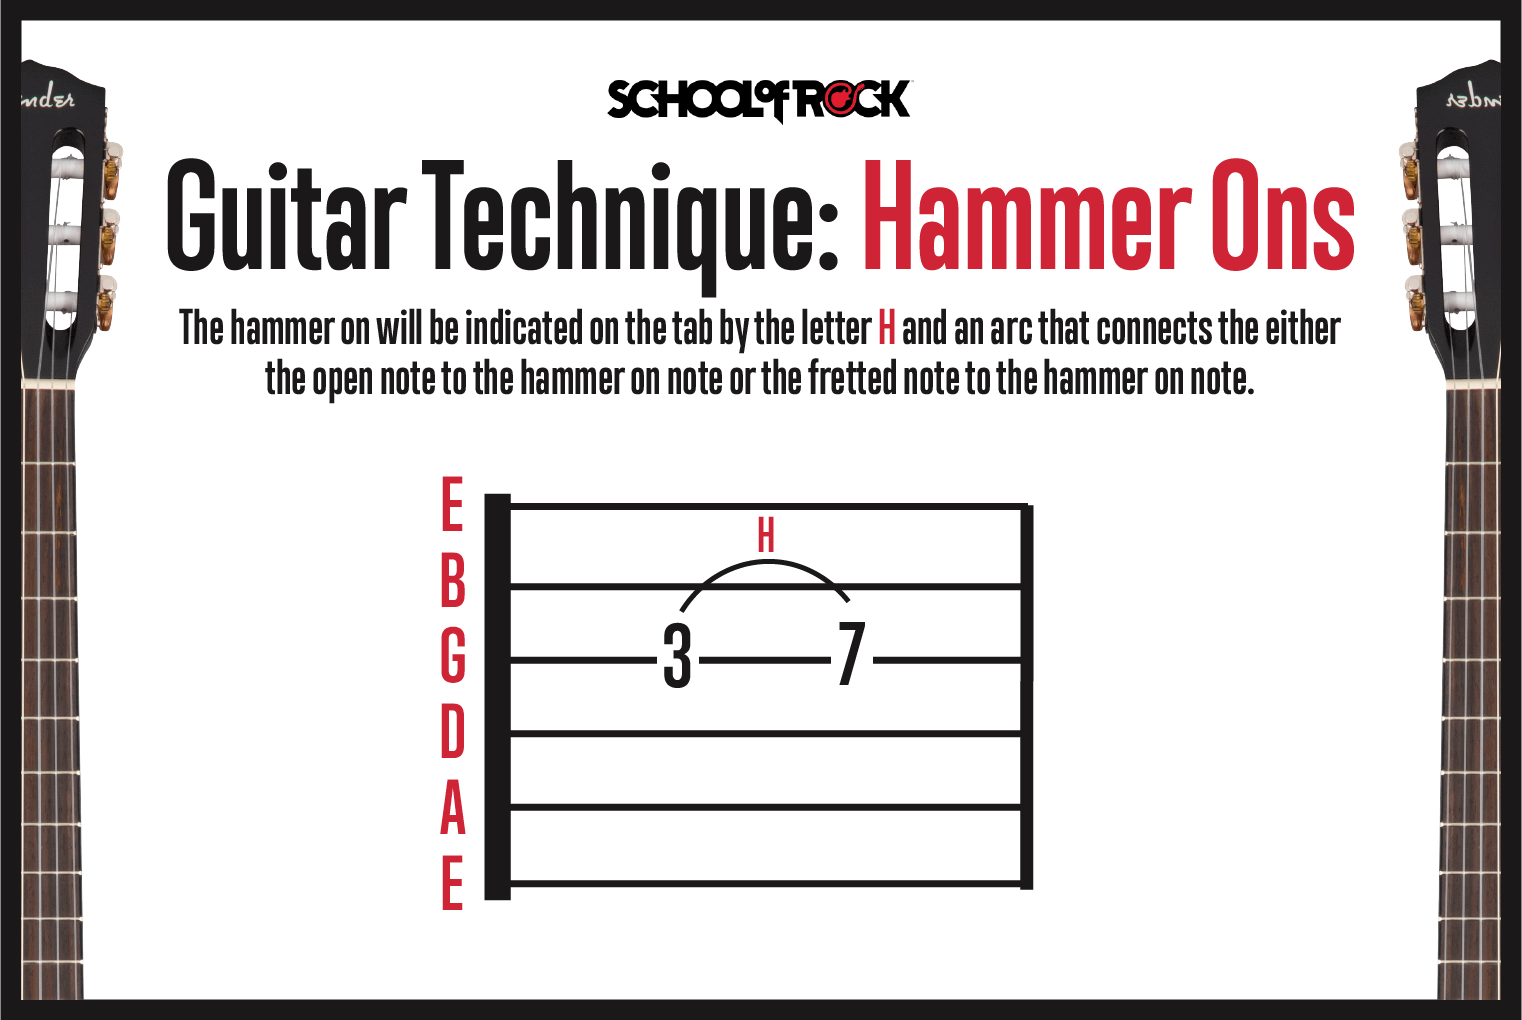 Guitar technique hammer ons